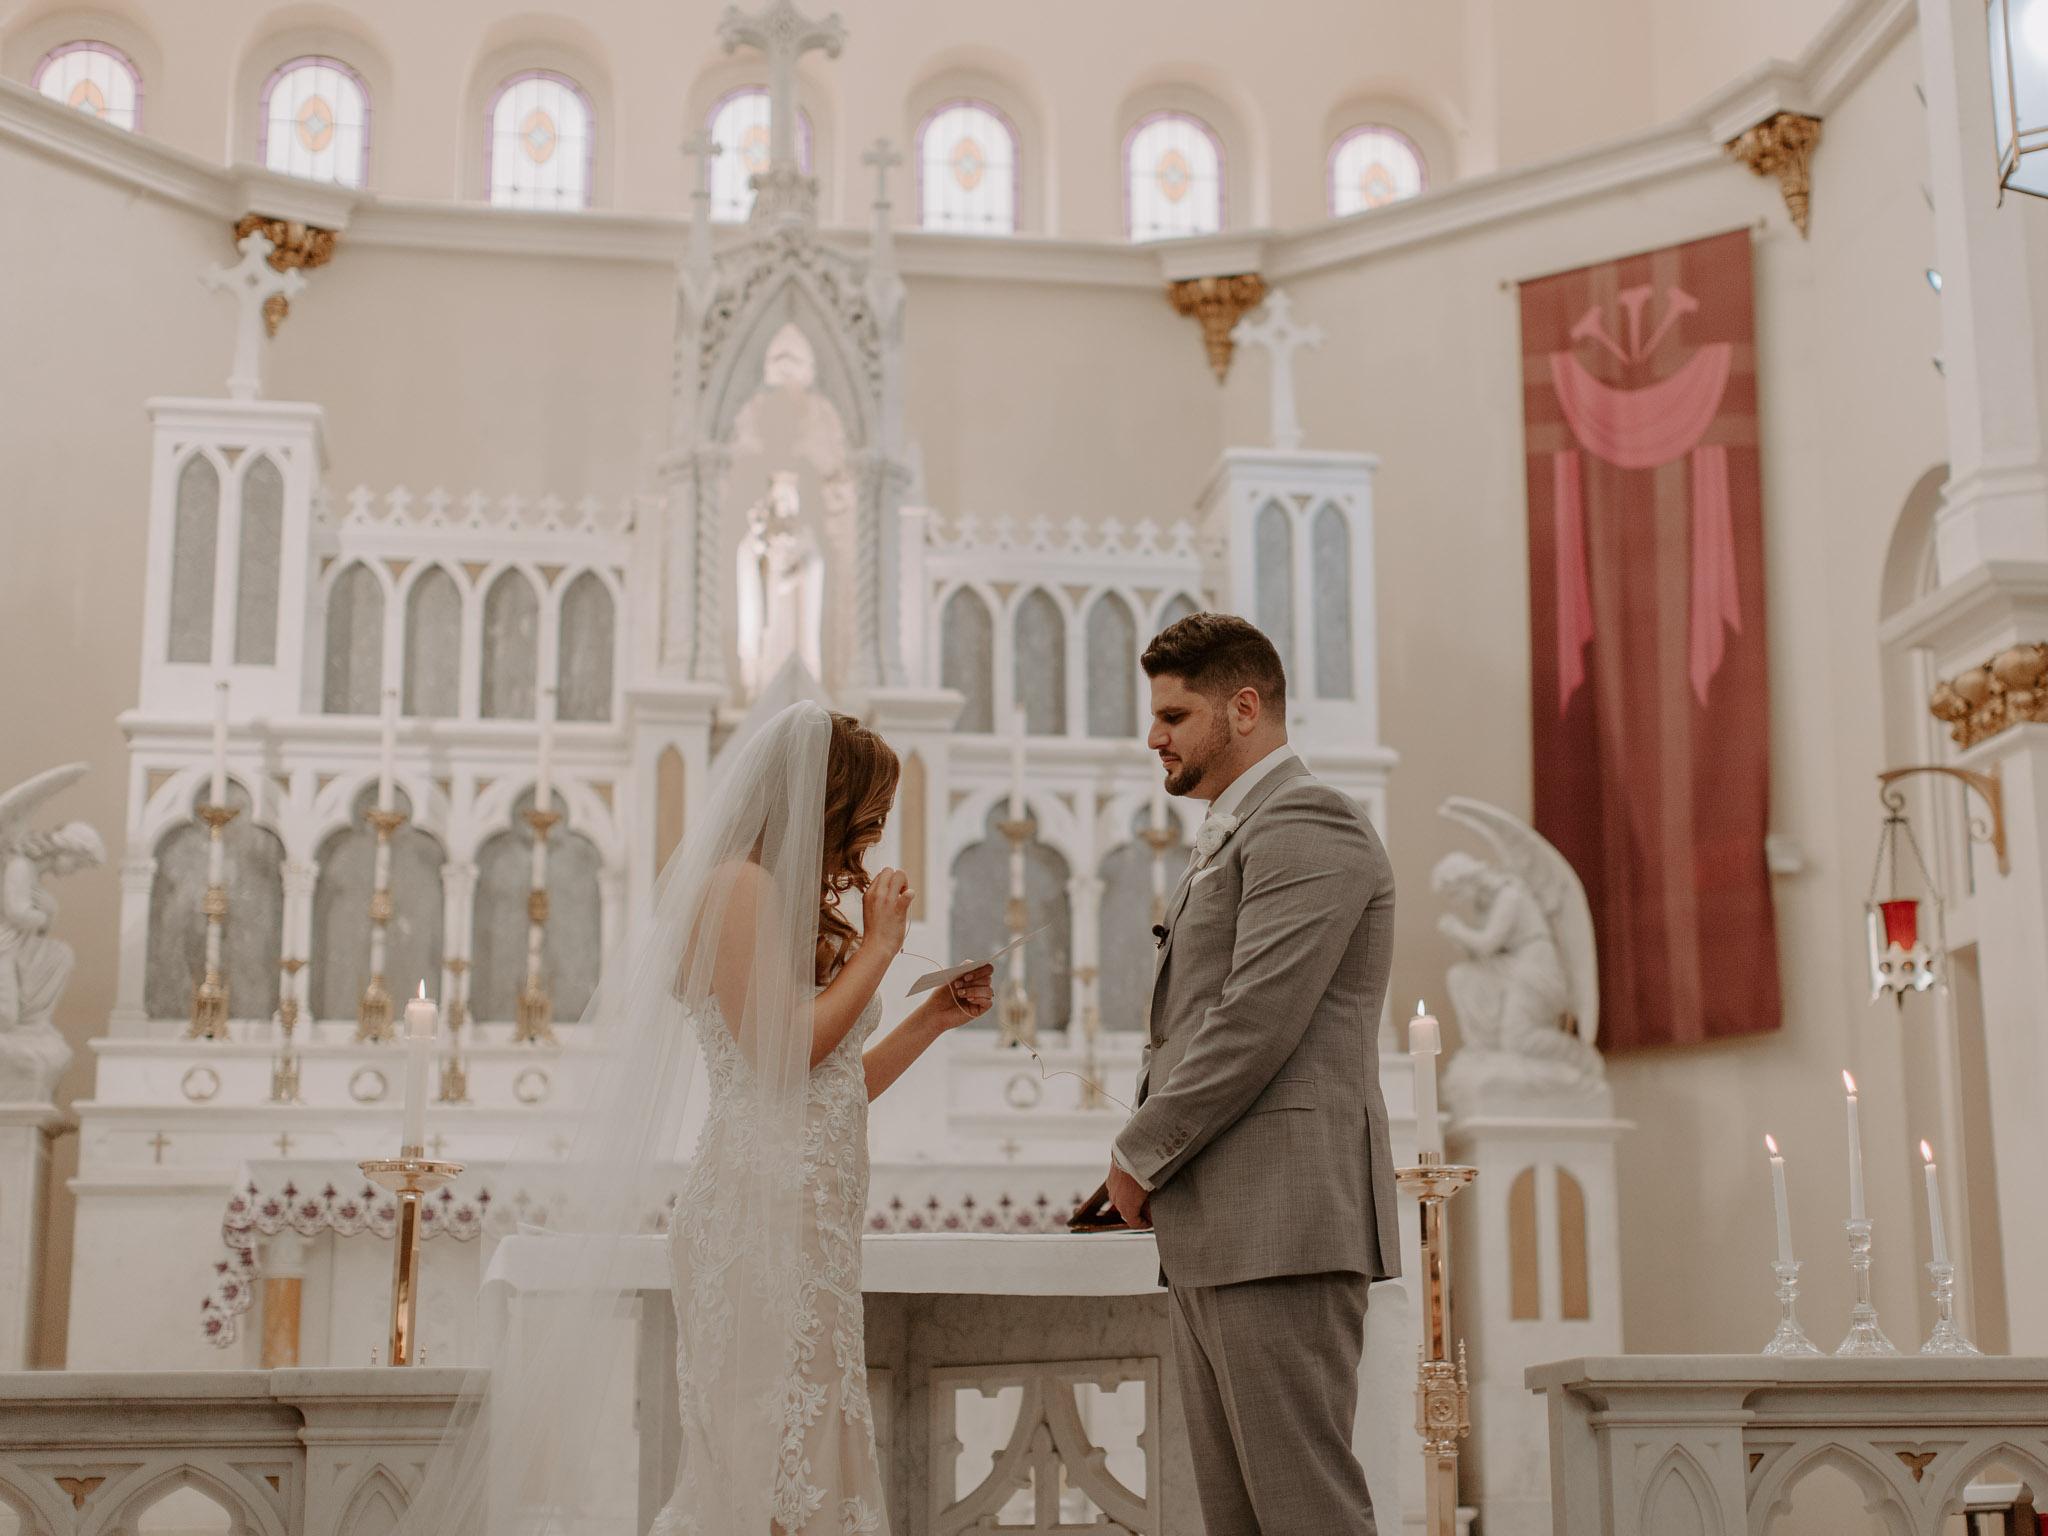 Catholic Houston Texas Flare Wedding Bell Tower-7816.jpg